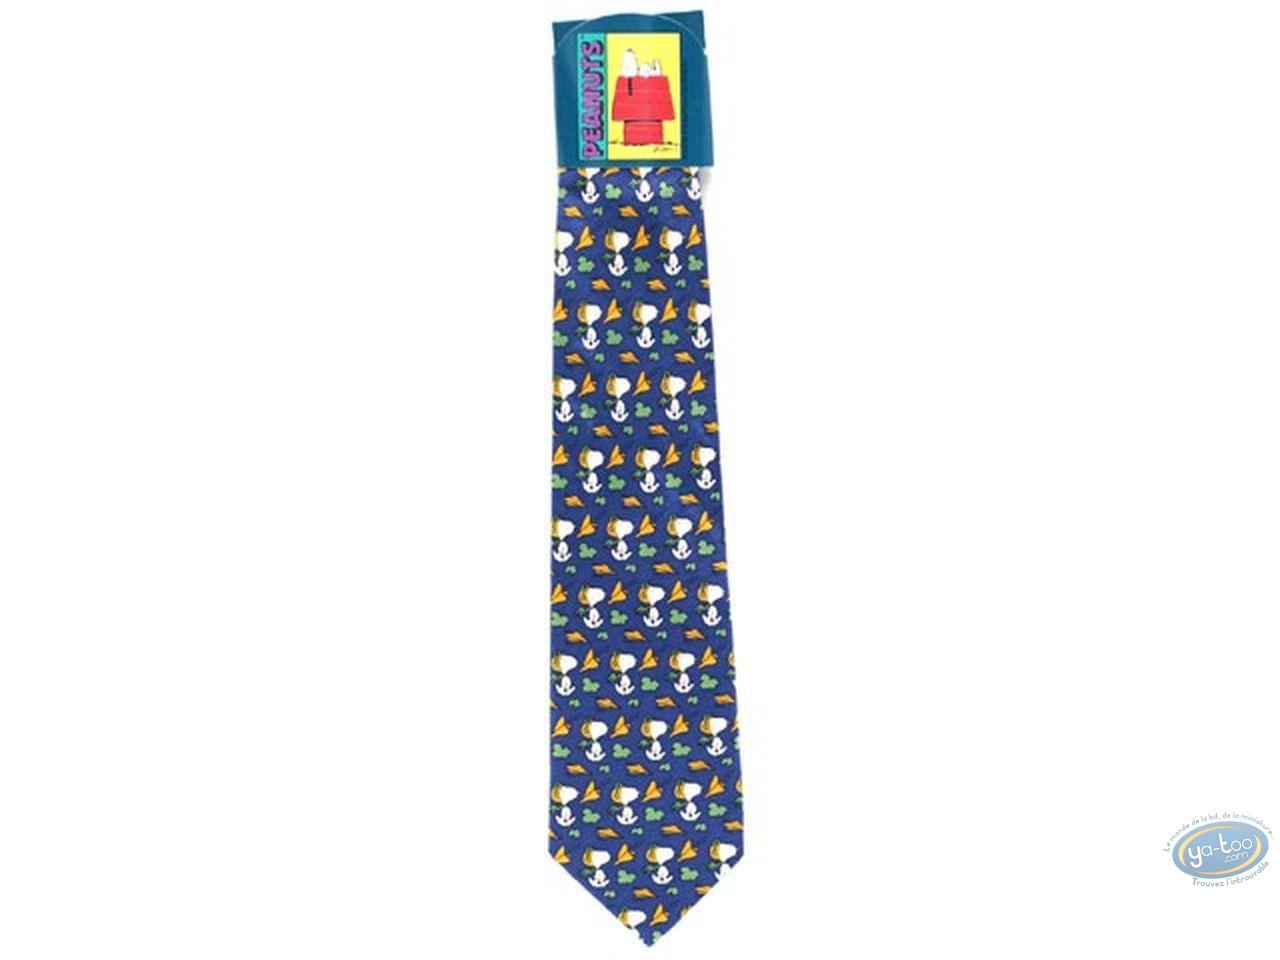 Vêtement, Snoopy : Cravate, Snoopy aviateur bleu marine